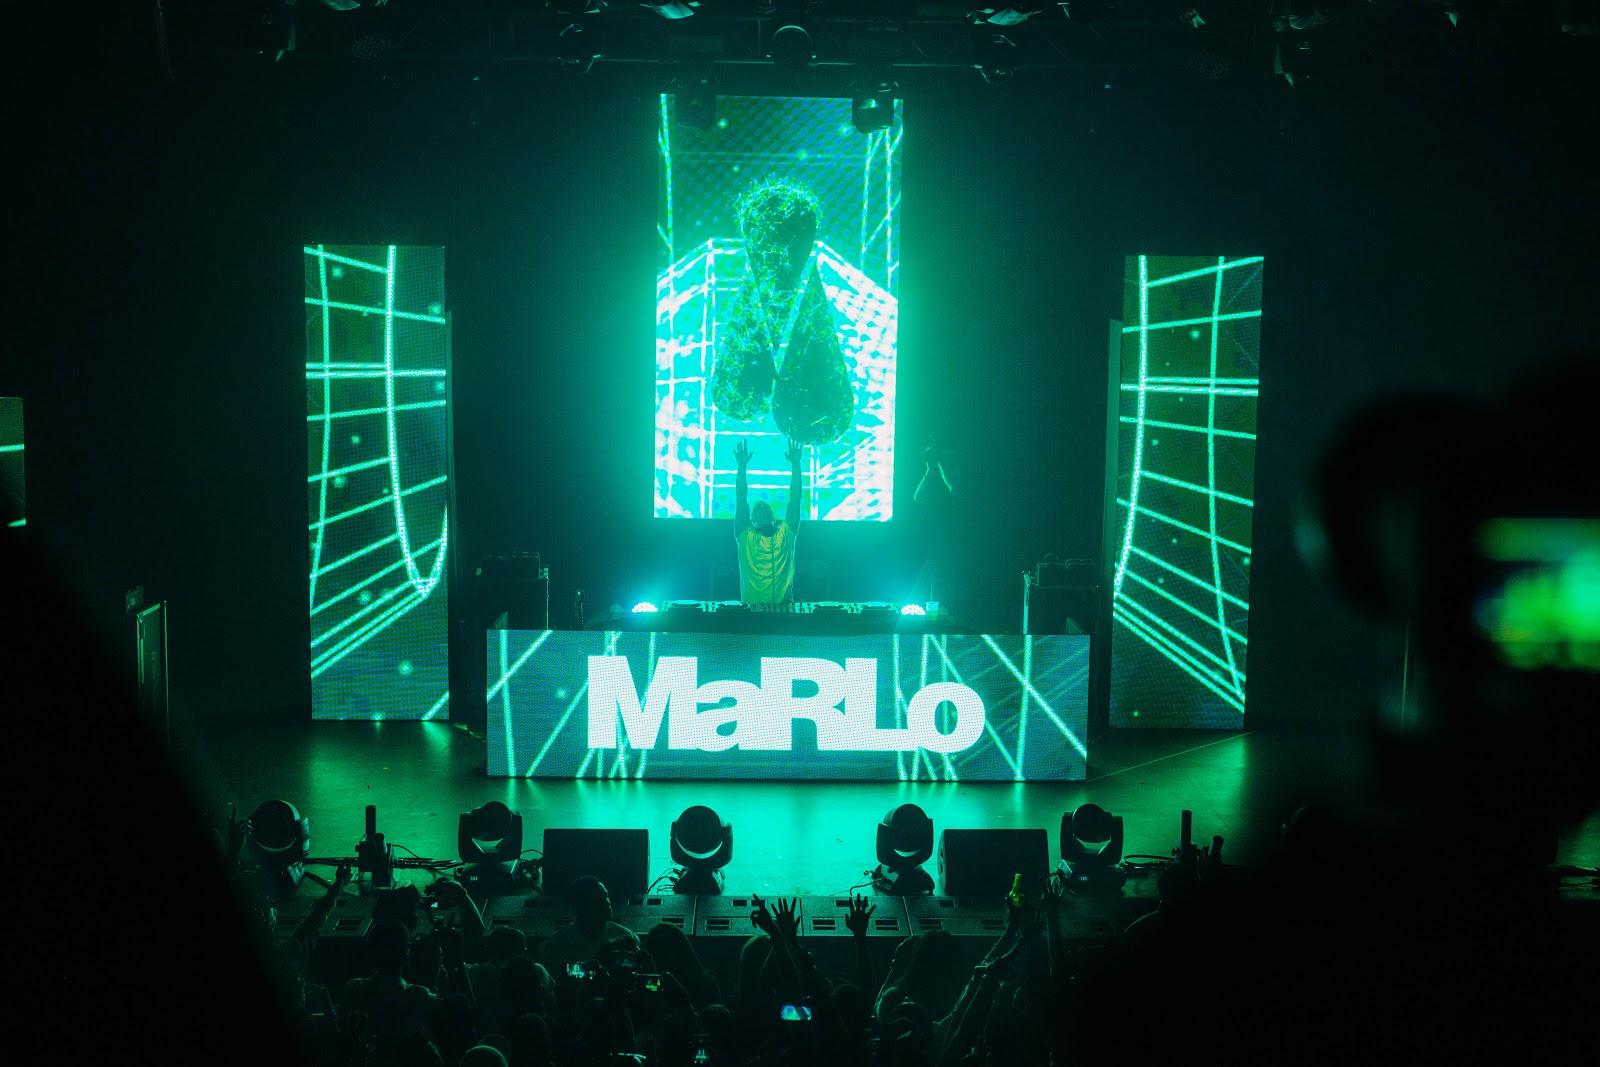 MARLO KL 2019 Heineken Live Your Music